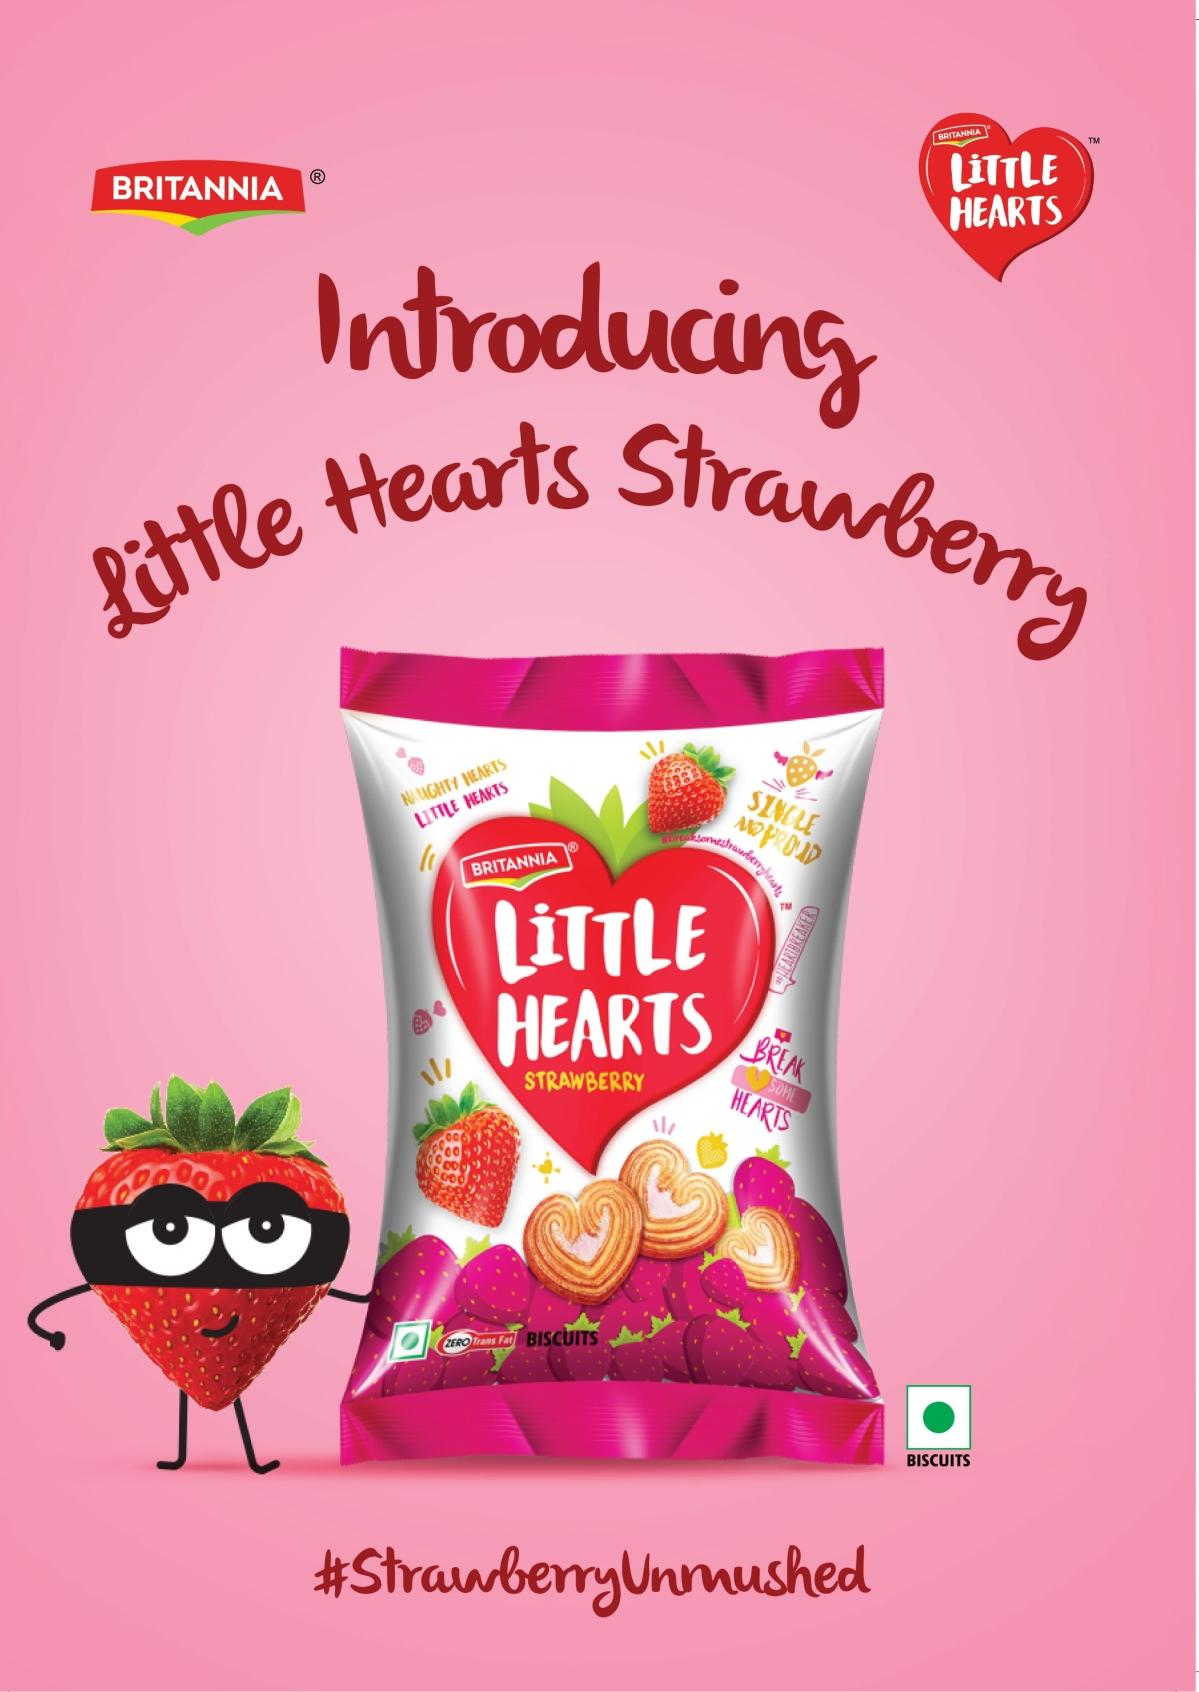 Britannia gets 'Ninja' to push Strawberry variant of Little Hearts